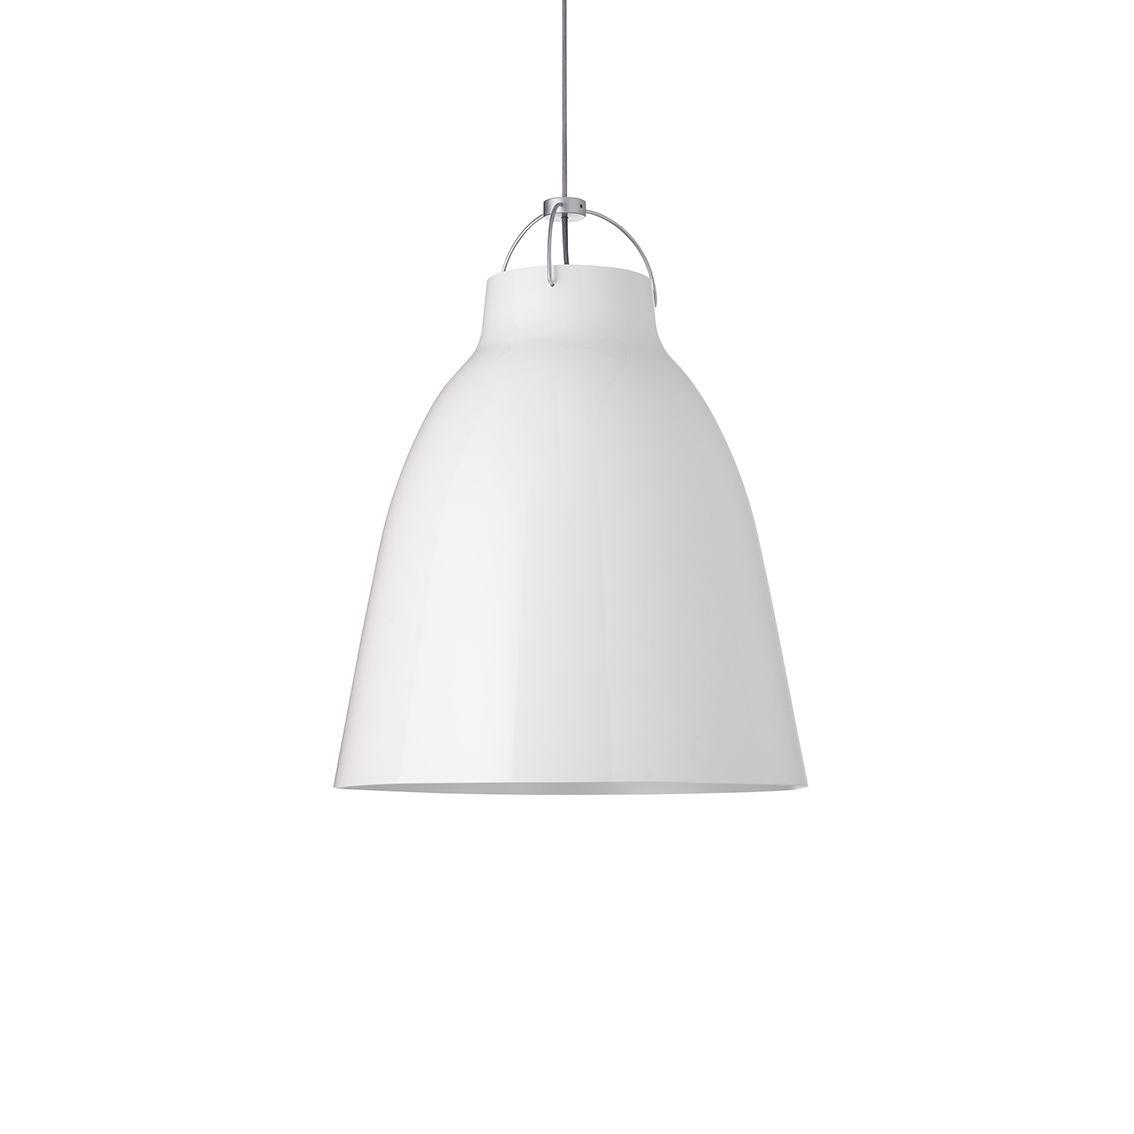 Caravaggio hanglamp Lightyears Ø11 hoogglans wit